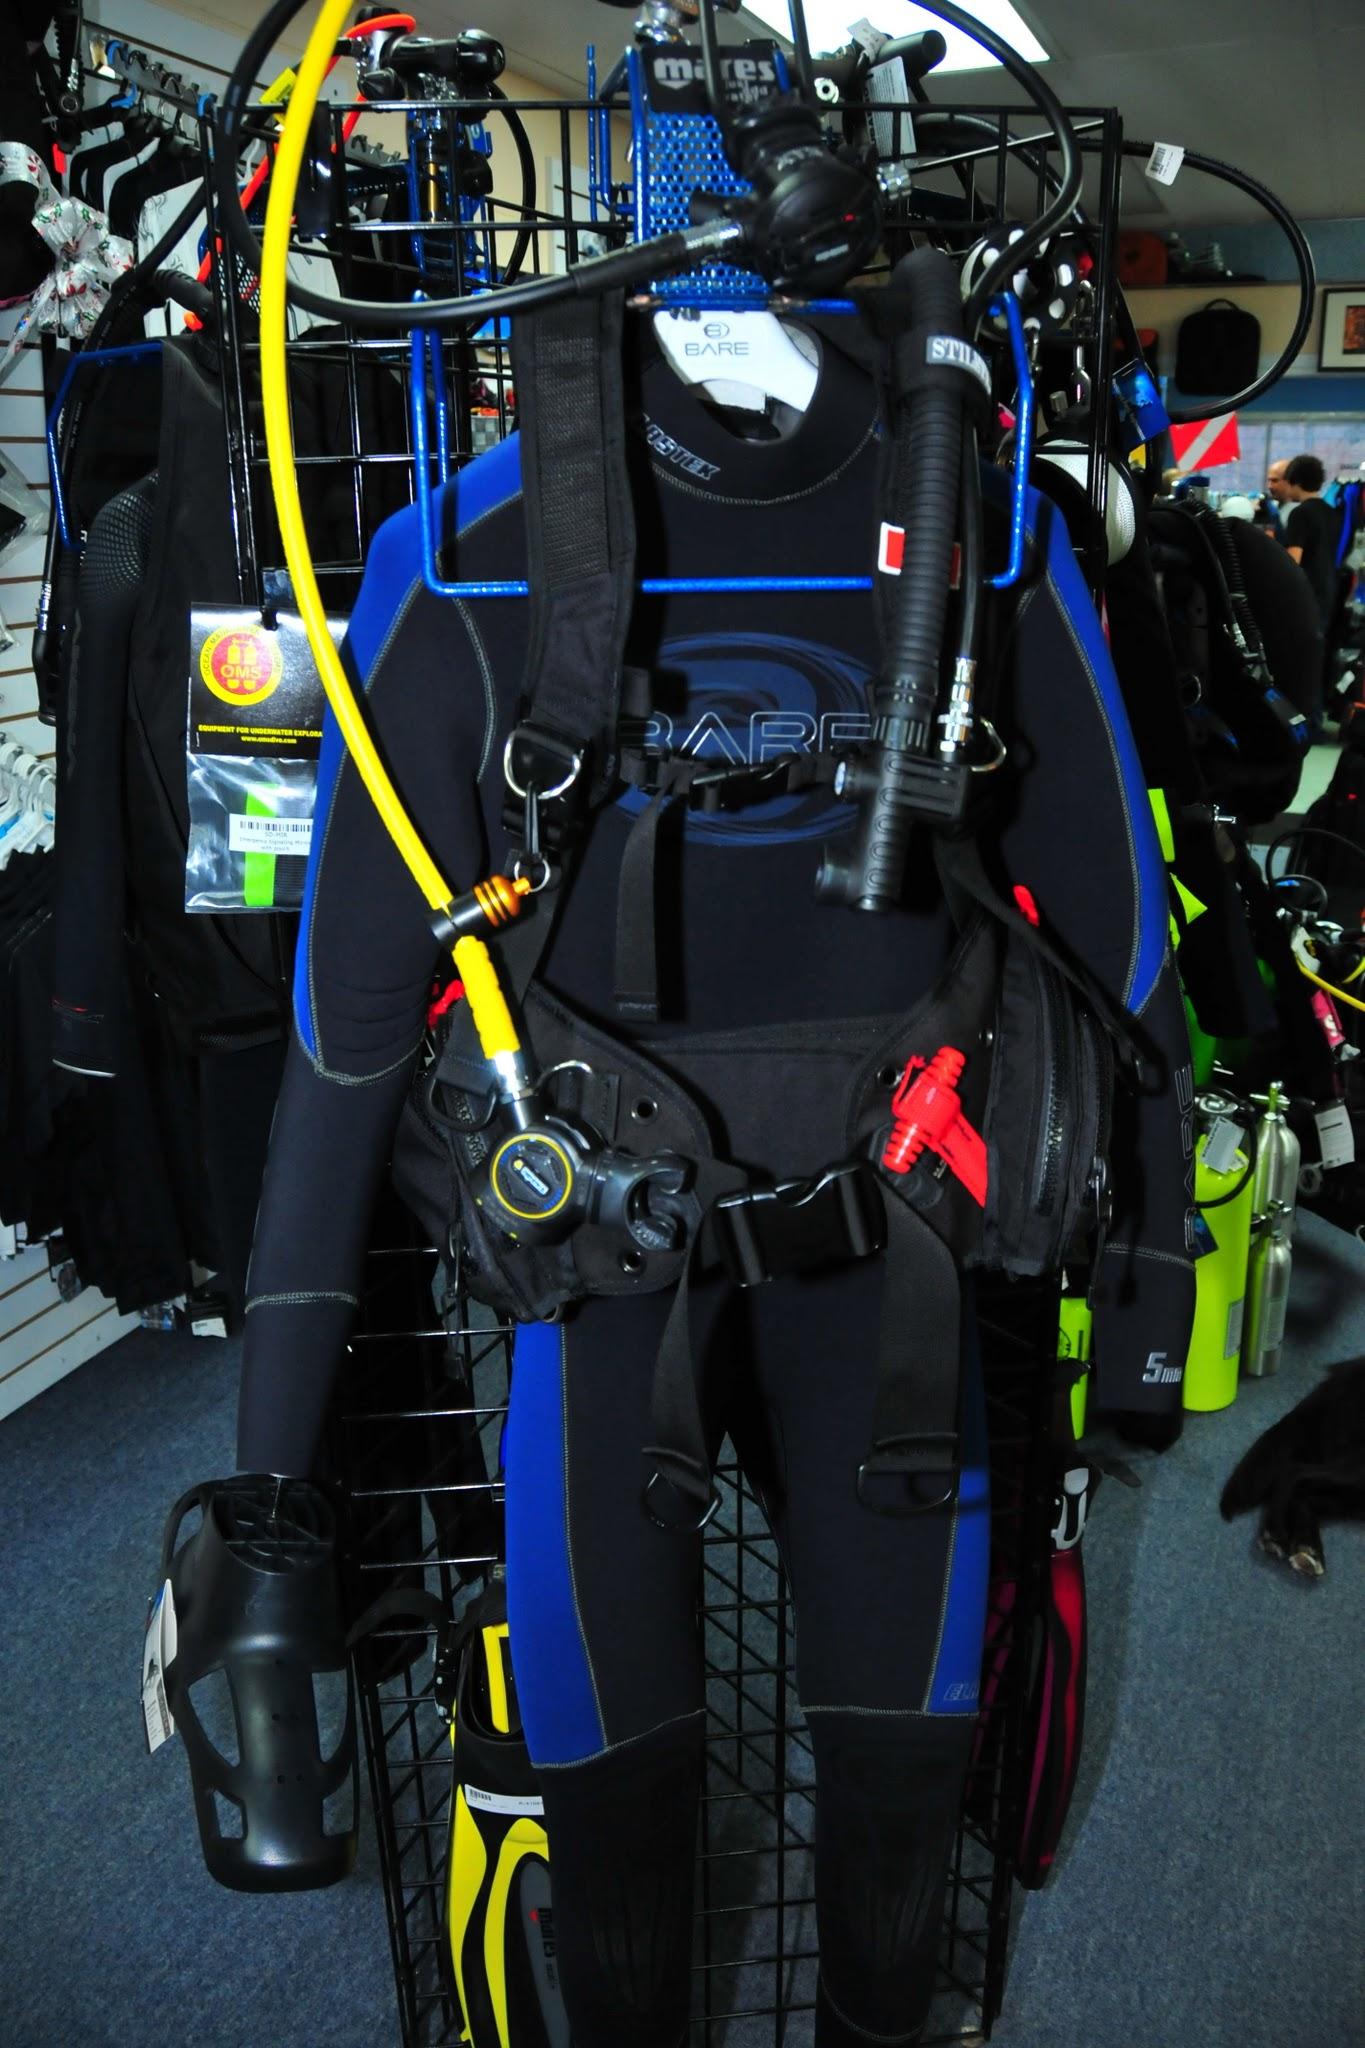 Montreal Diving Action Scuba Padi Equipment Specialist